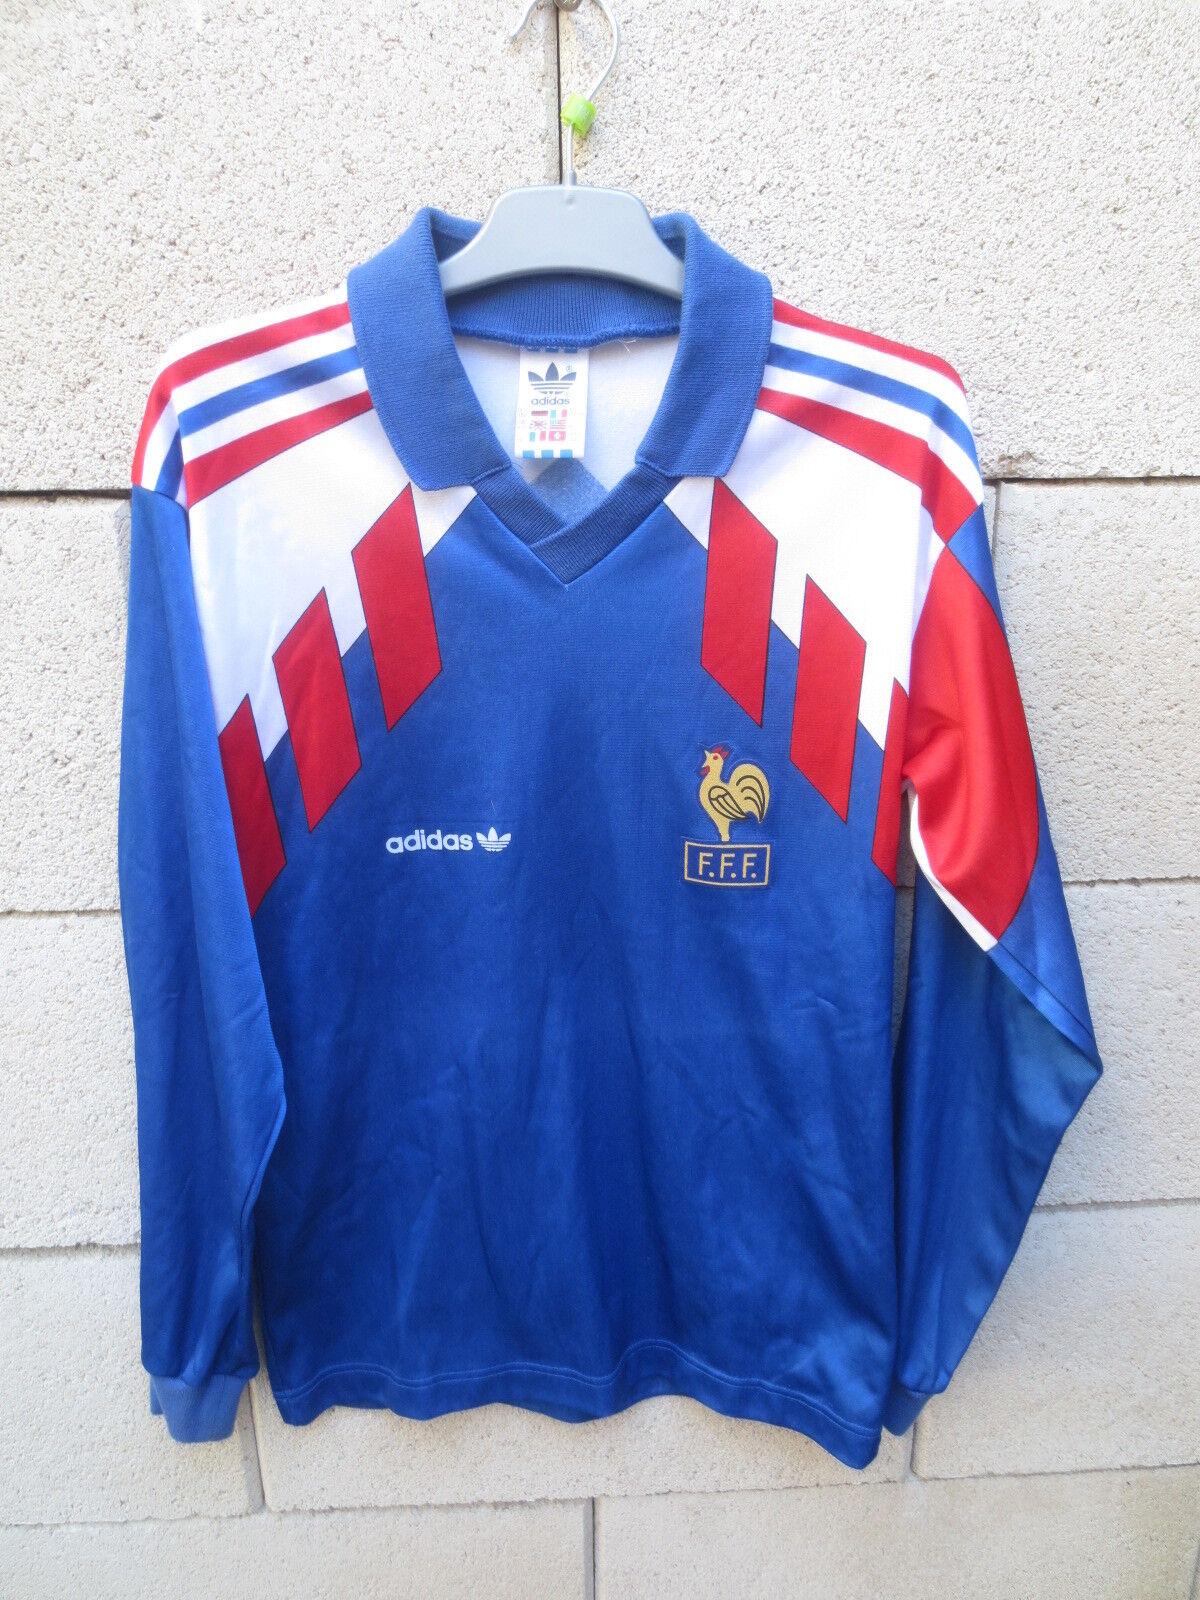 Maillot EQUIPE DE FRANCE vintage ADIDAS shirt trikot 1990 maglia ancien 12 ans